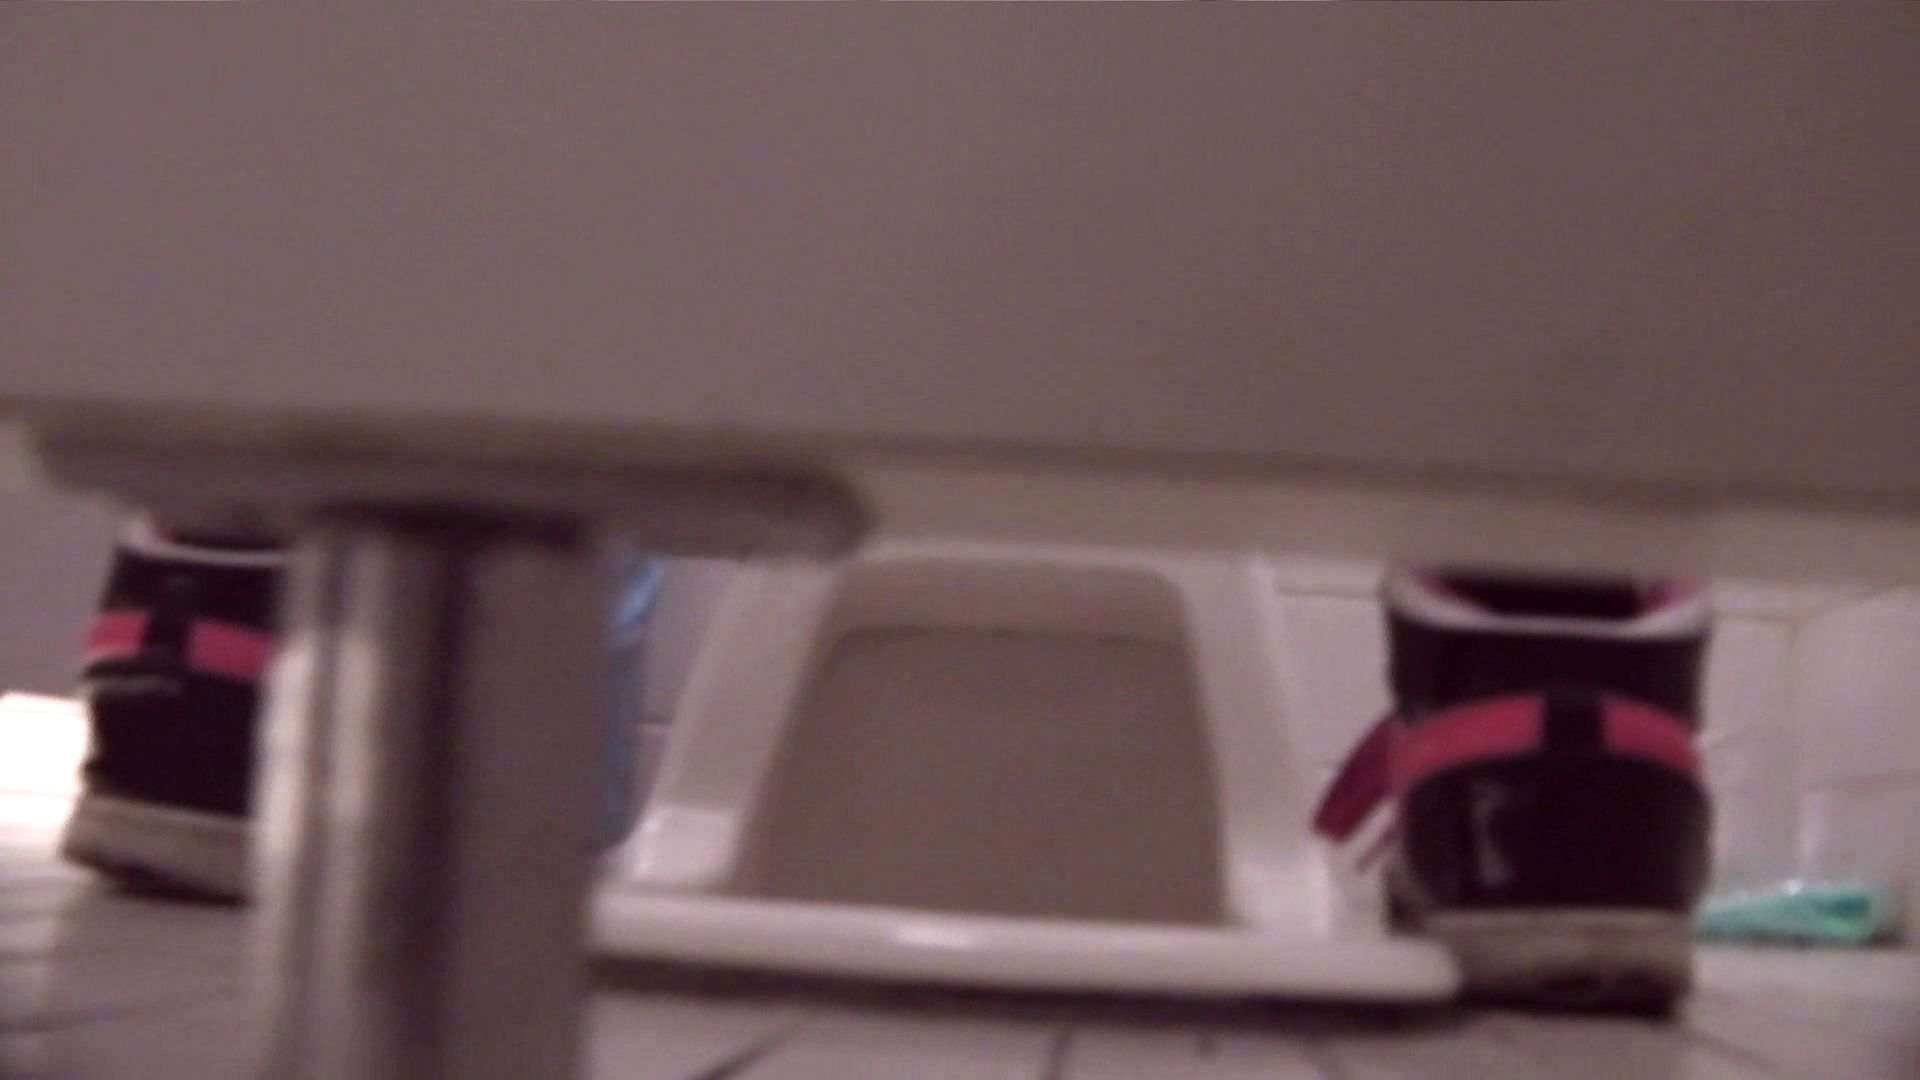 vol.15 命がけ潜伏洗面所! 肌荒れ注意報!! プライベート 濡れ場動画紹介 89画像 75